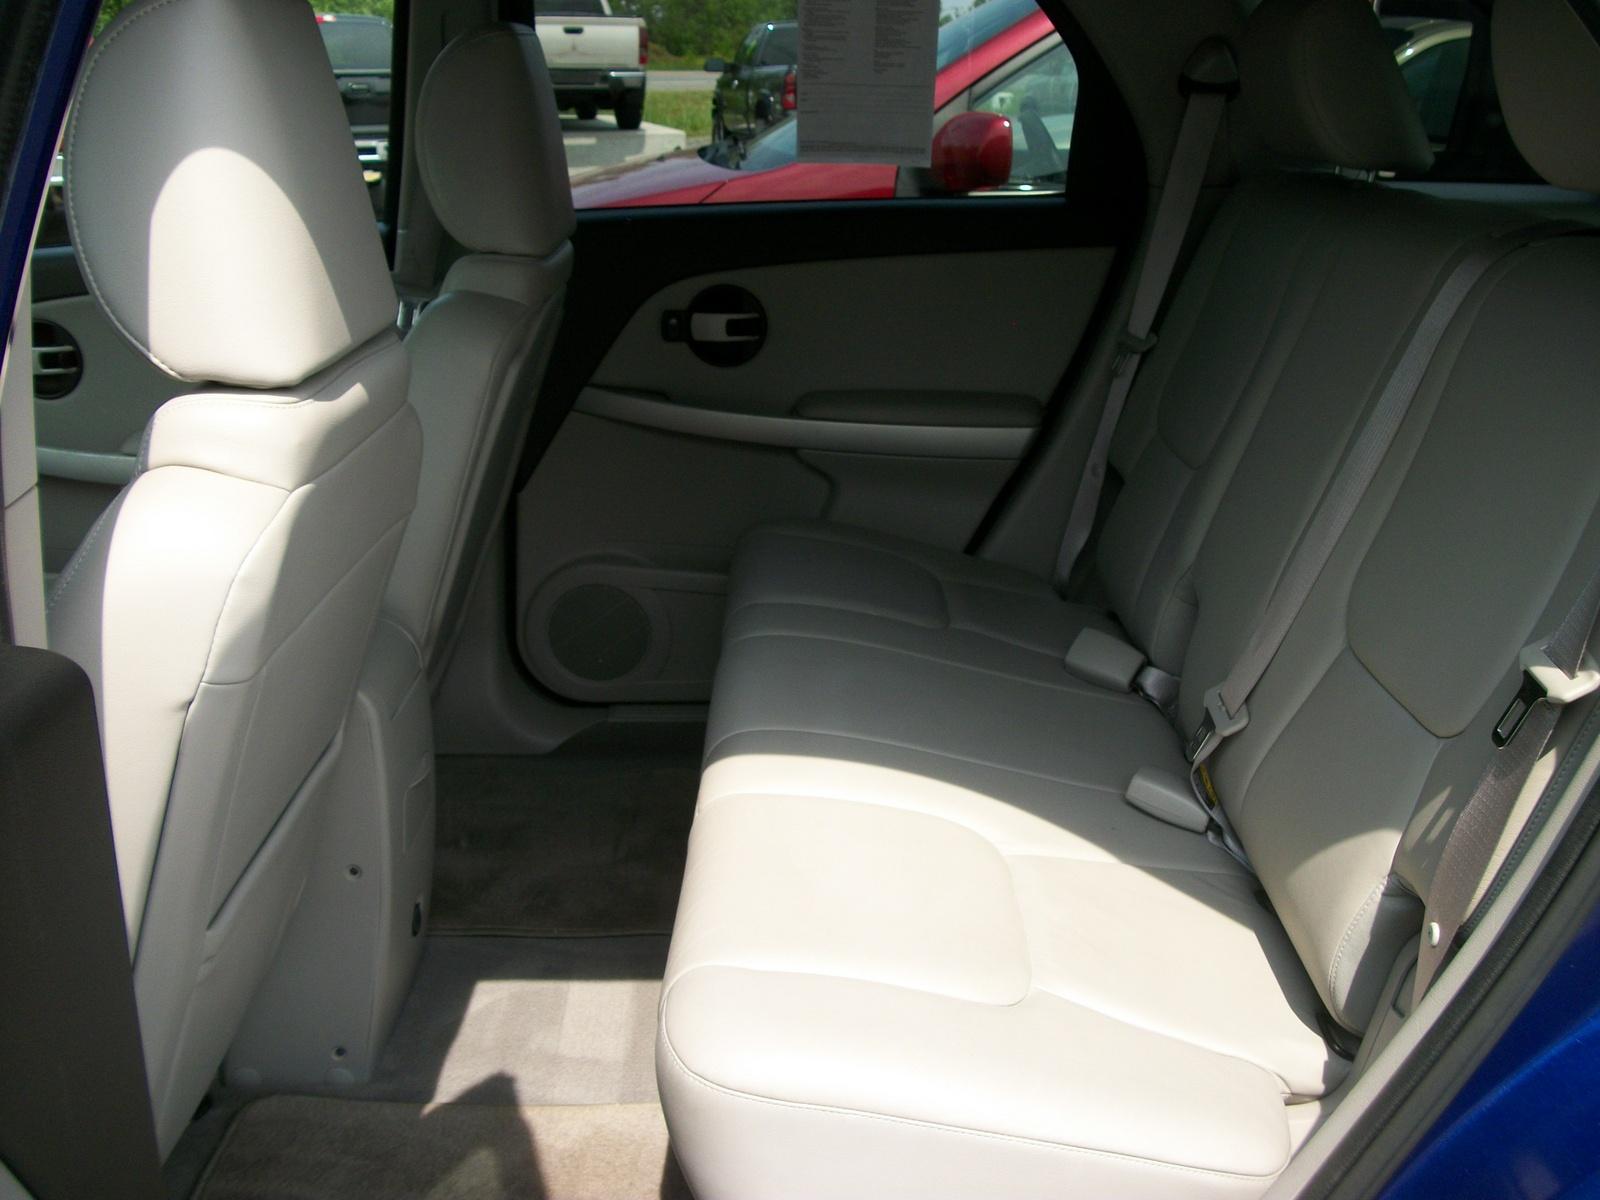 CHEVROLET EQUINOX LT AWD interior